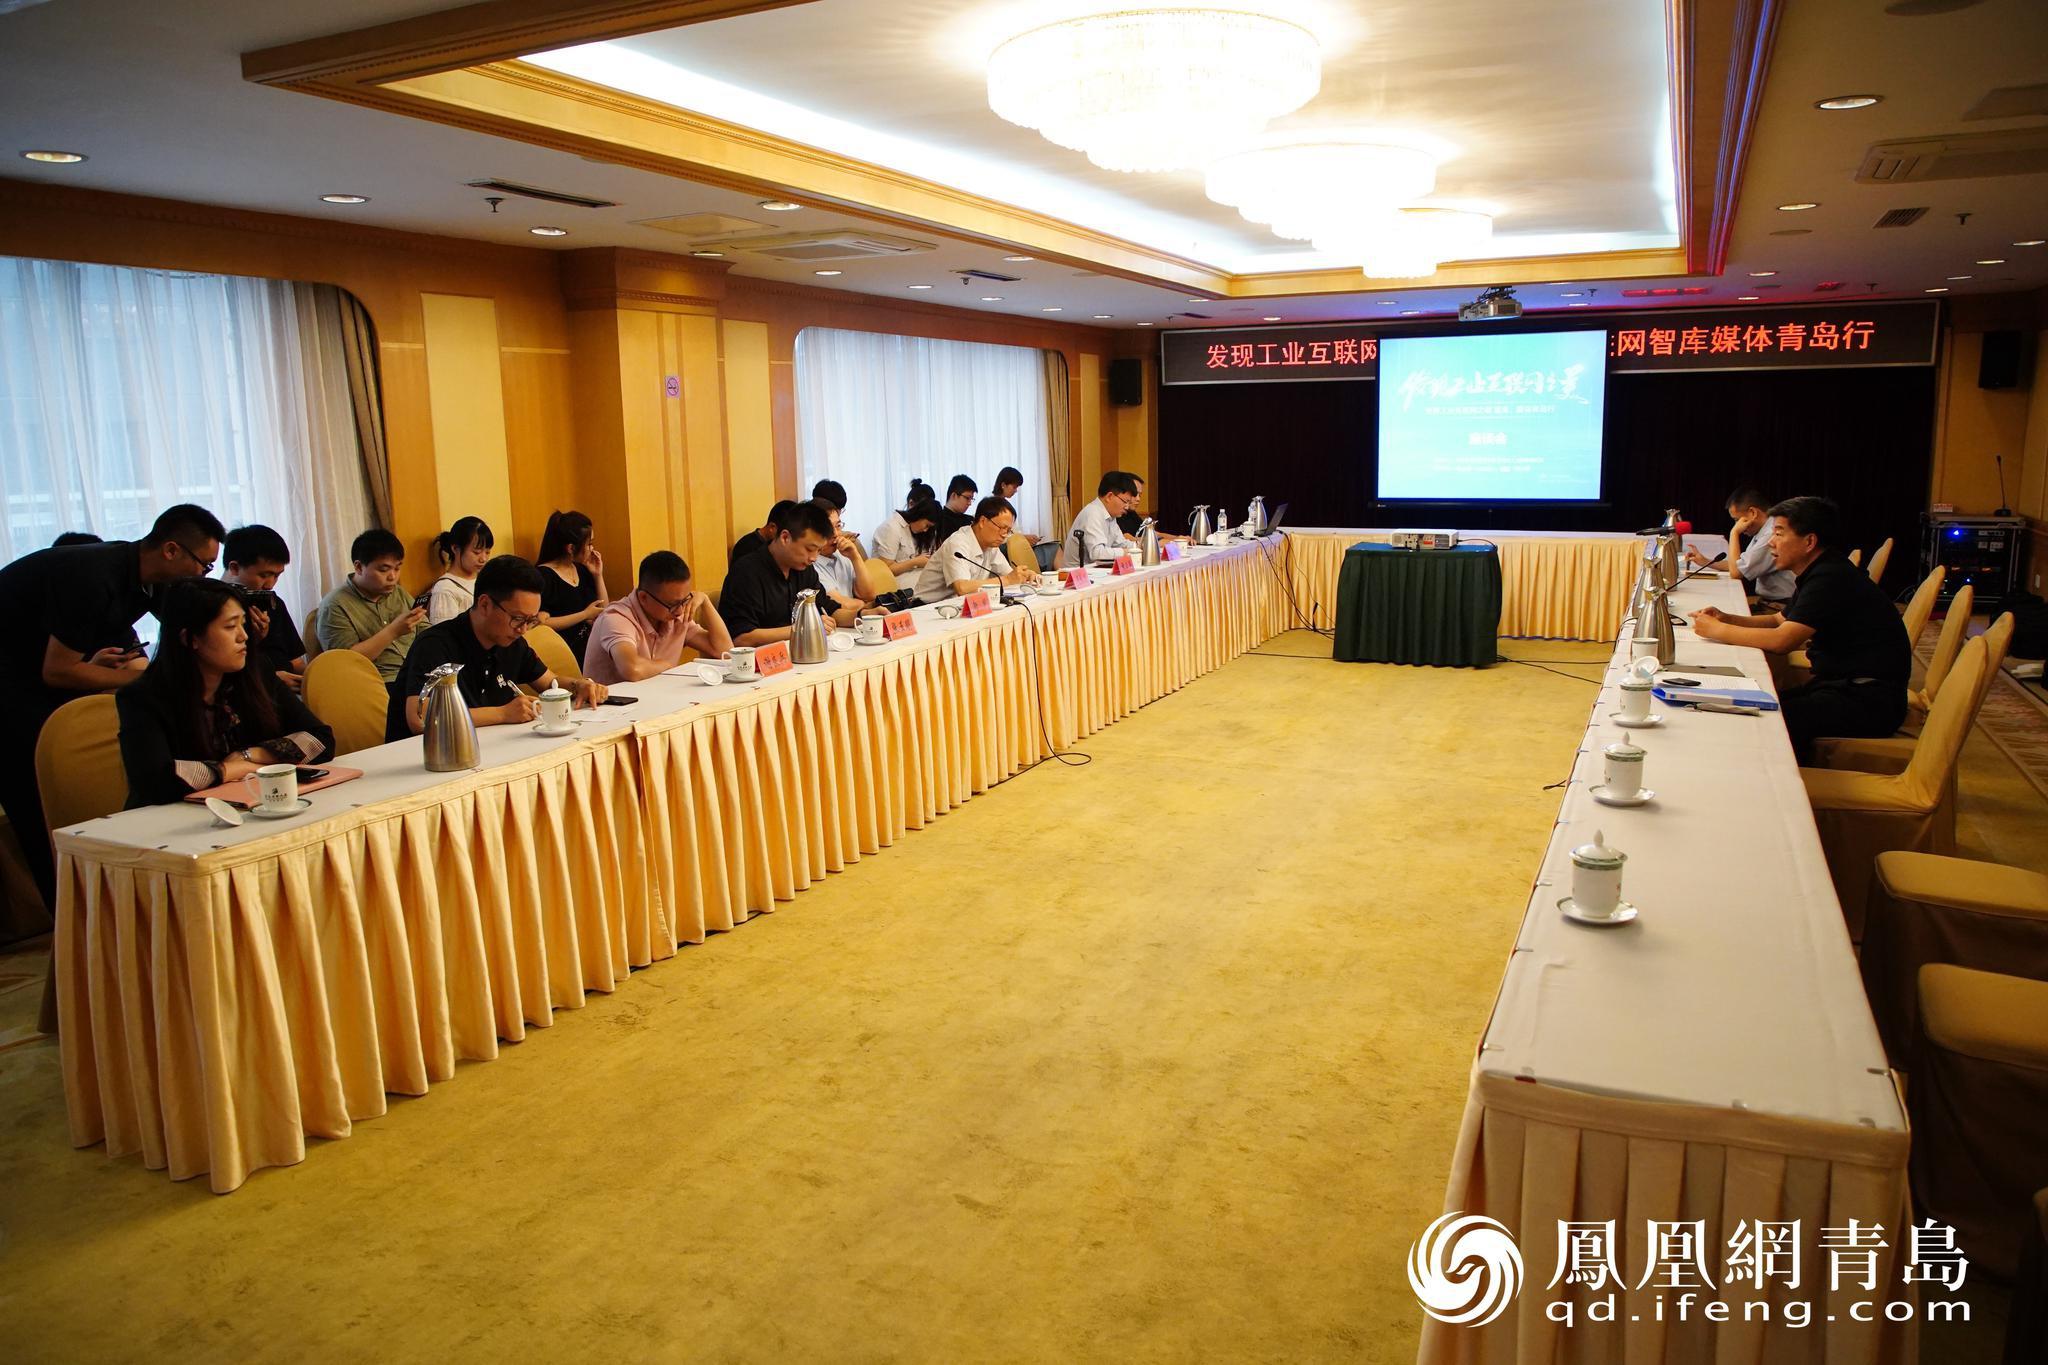 http://www.reviewcode.cn/yanfaguanli/165101.html